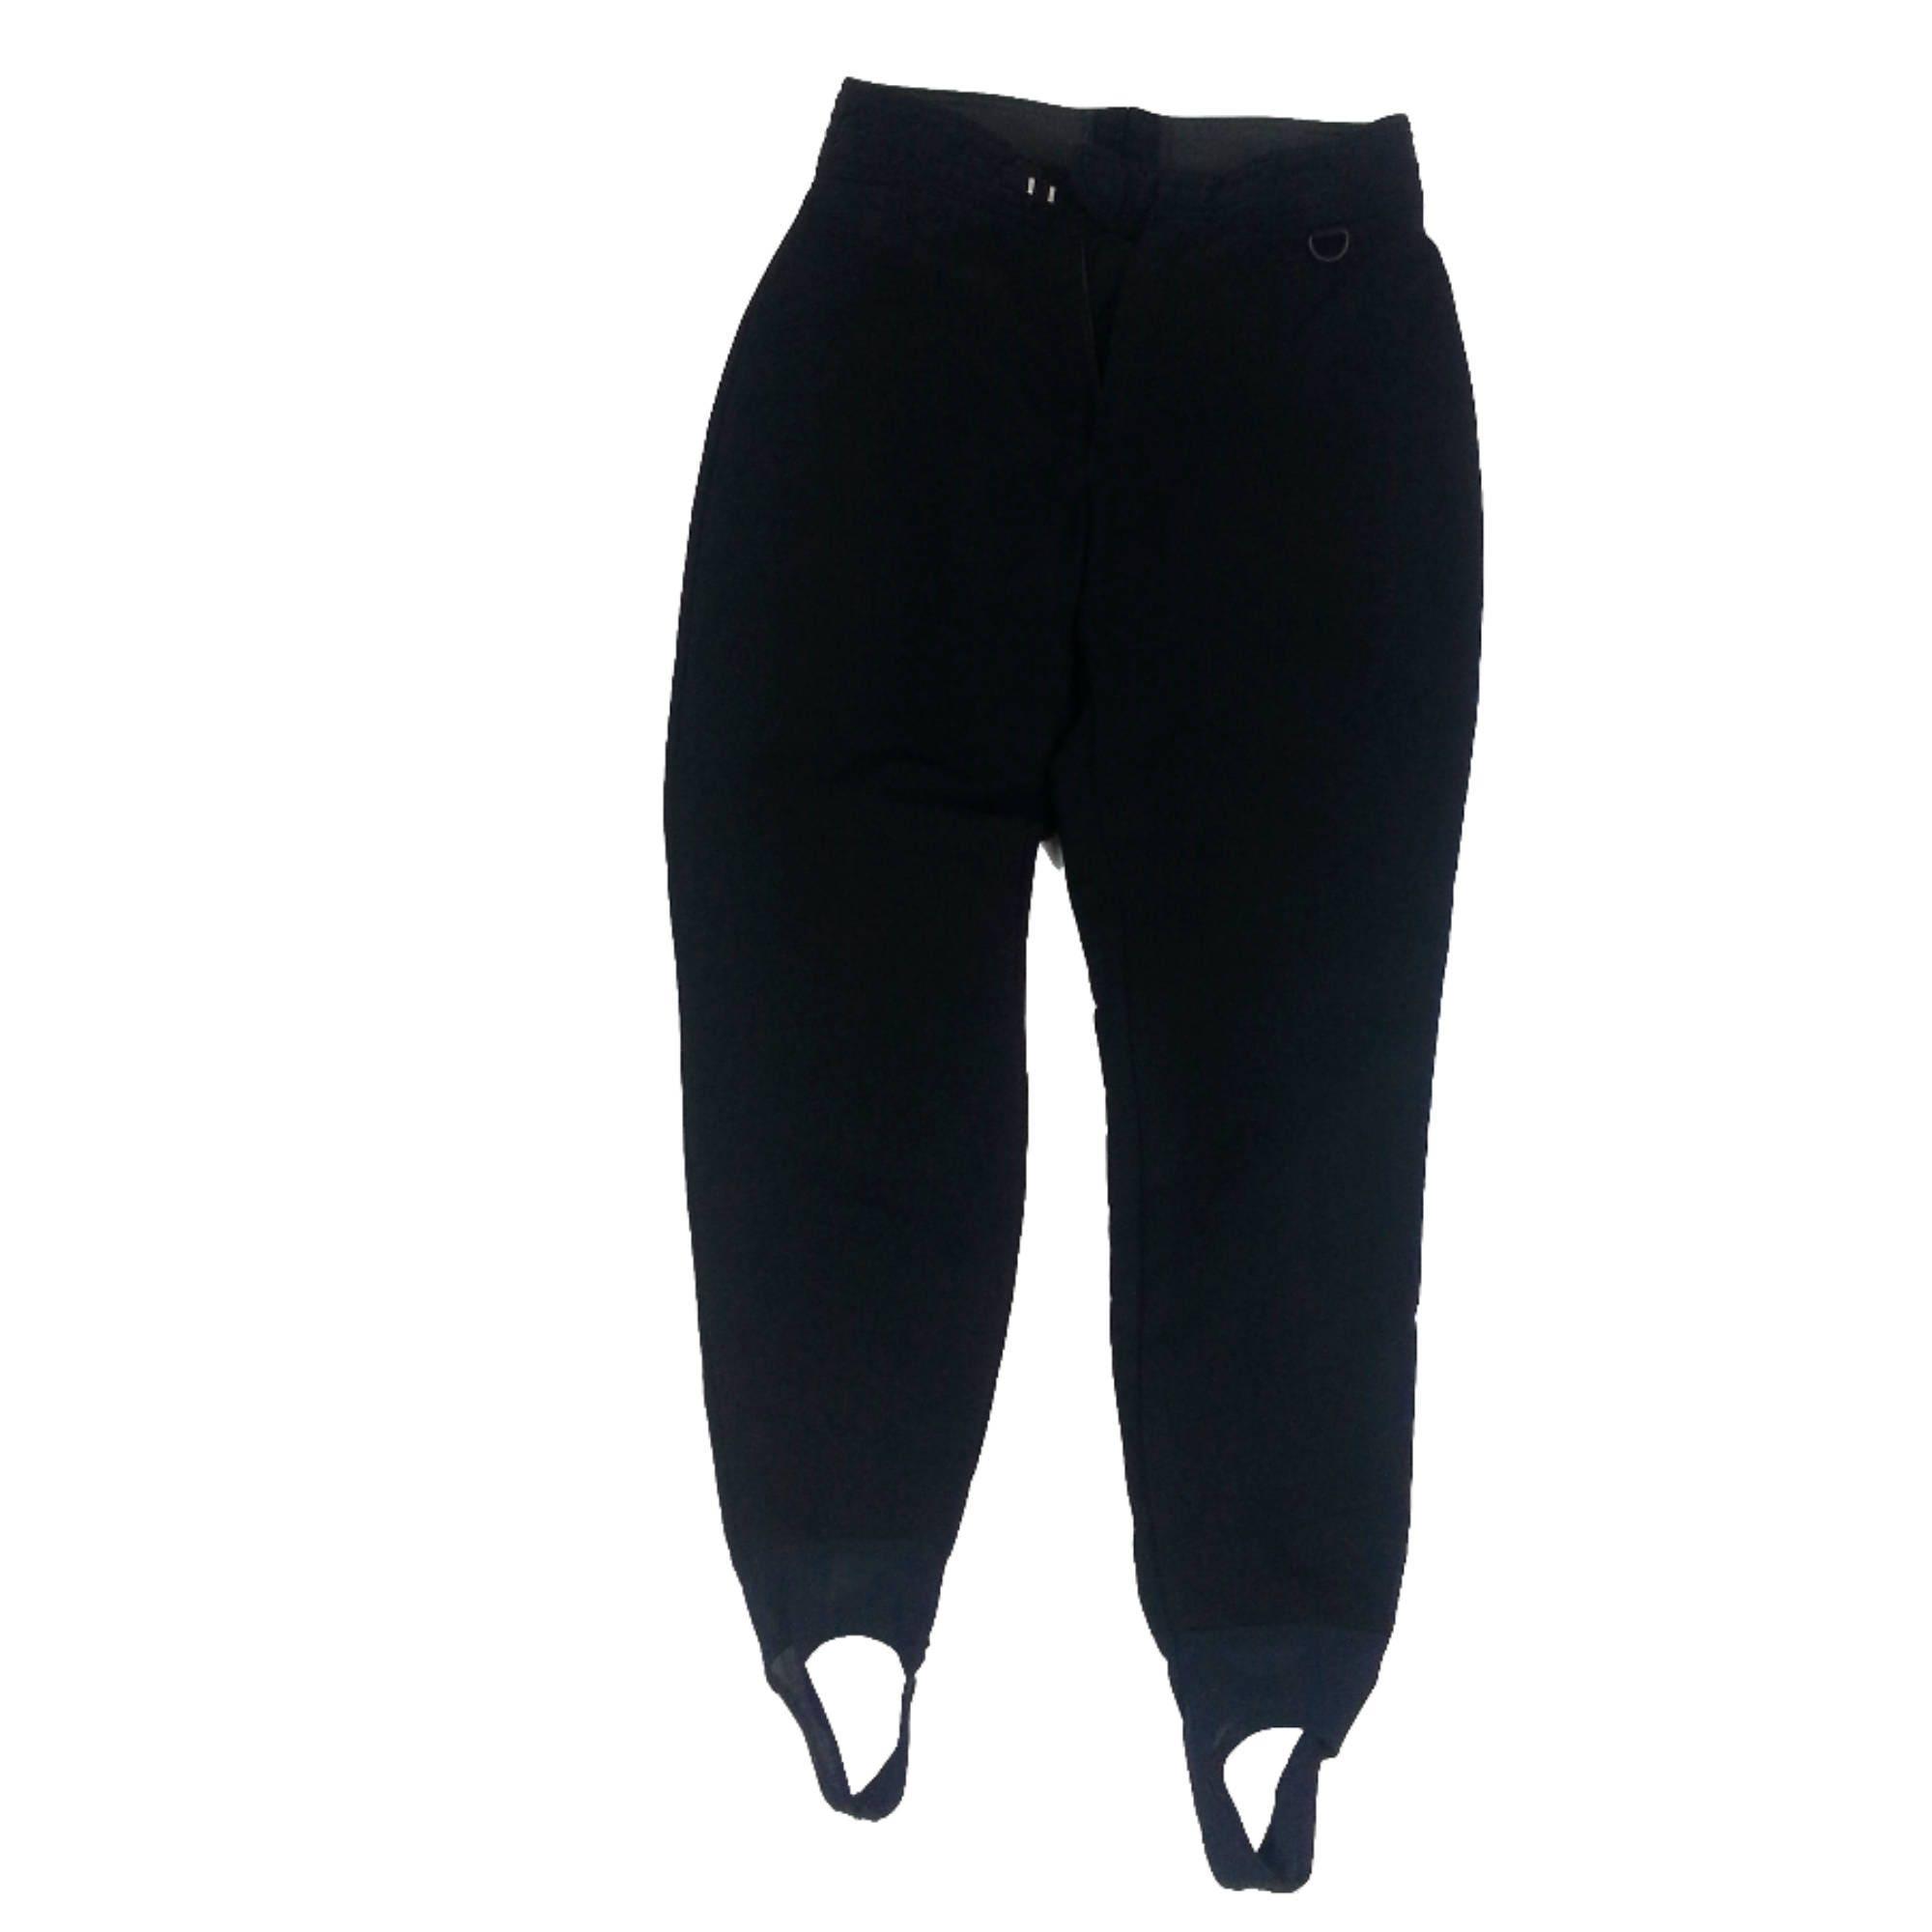 146c8e4688aa8 Black Wool Blend Ski Pants Size 10   vintage 80s snow skiing